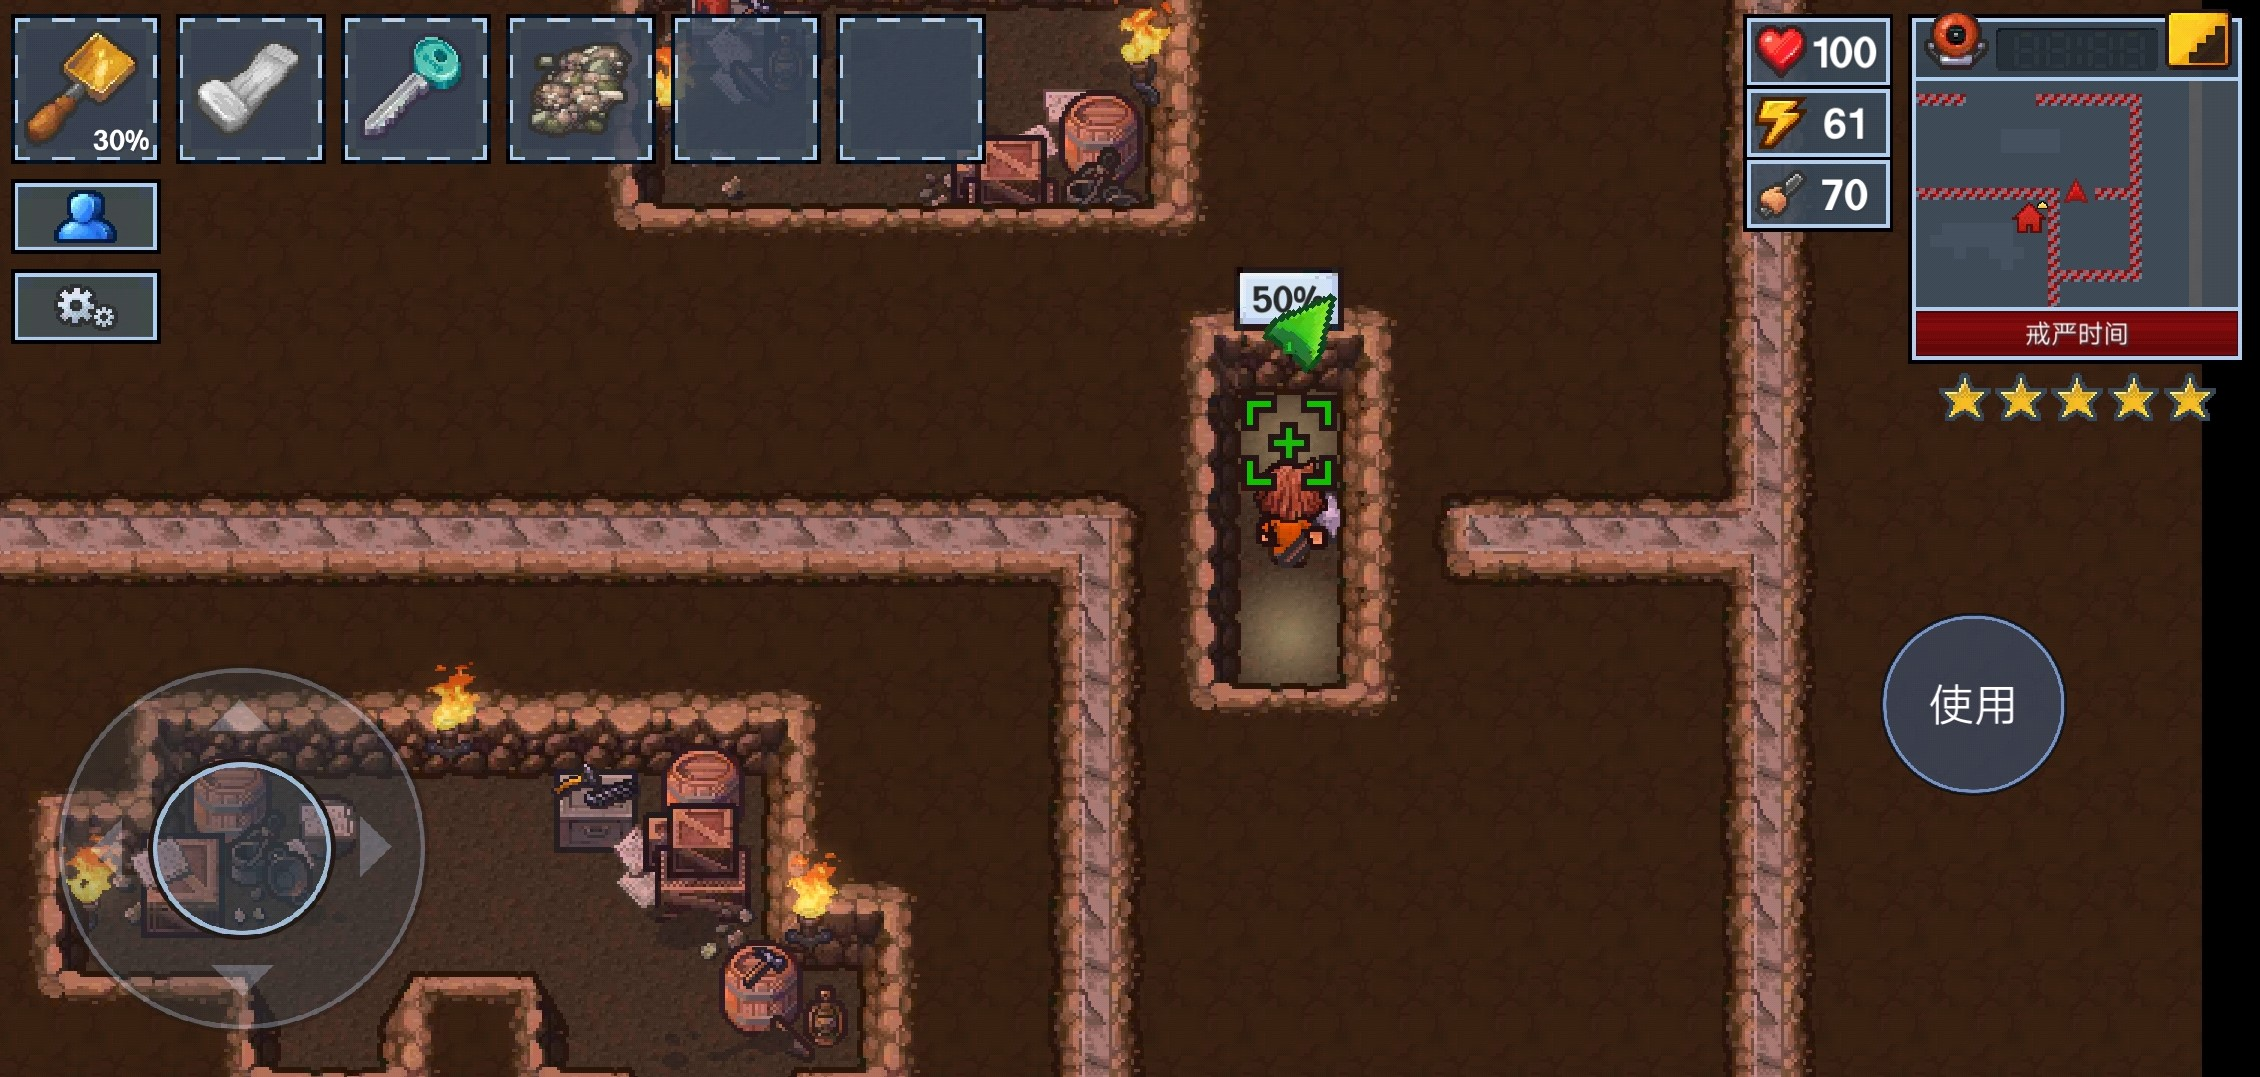 Steam移植作品《逃脱者:困境突围》登陆安卓平台